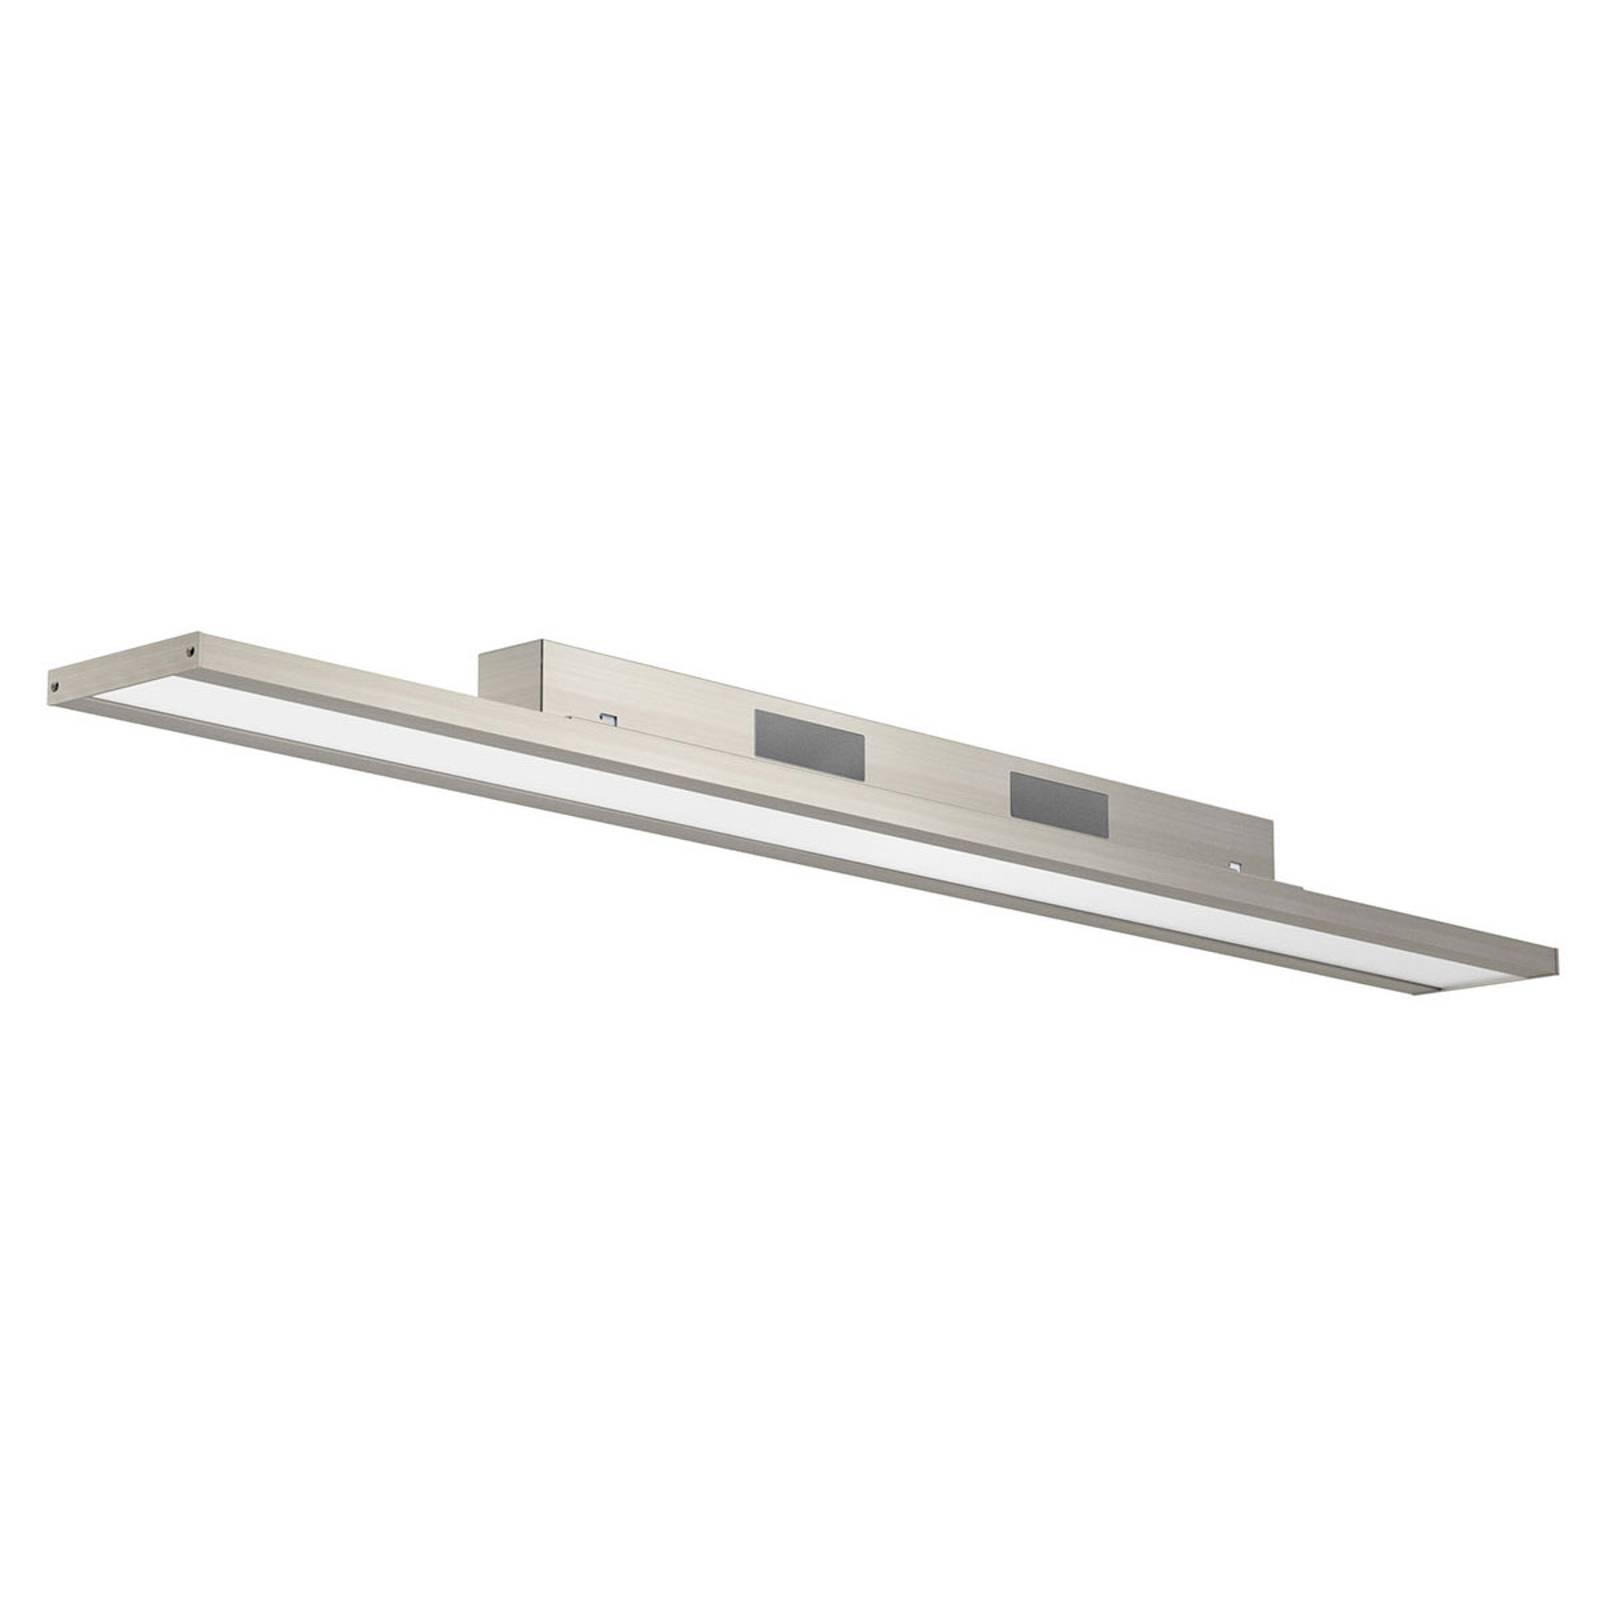 Sterke LED plafondlamp Classic Tec Basic